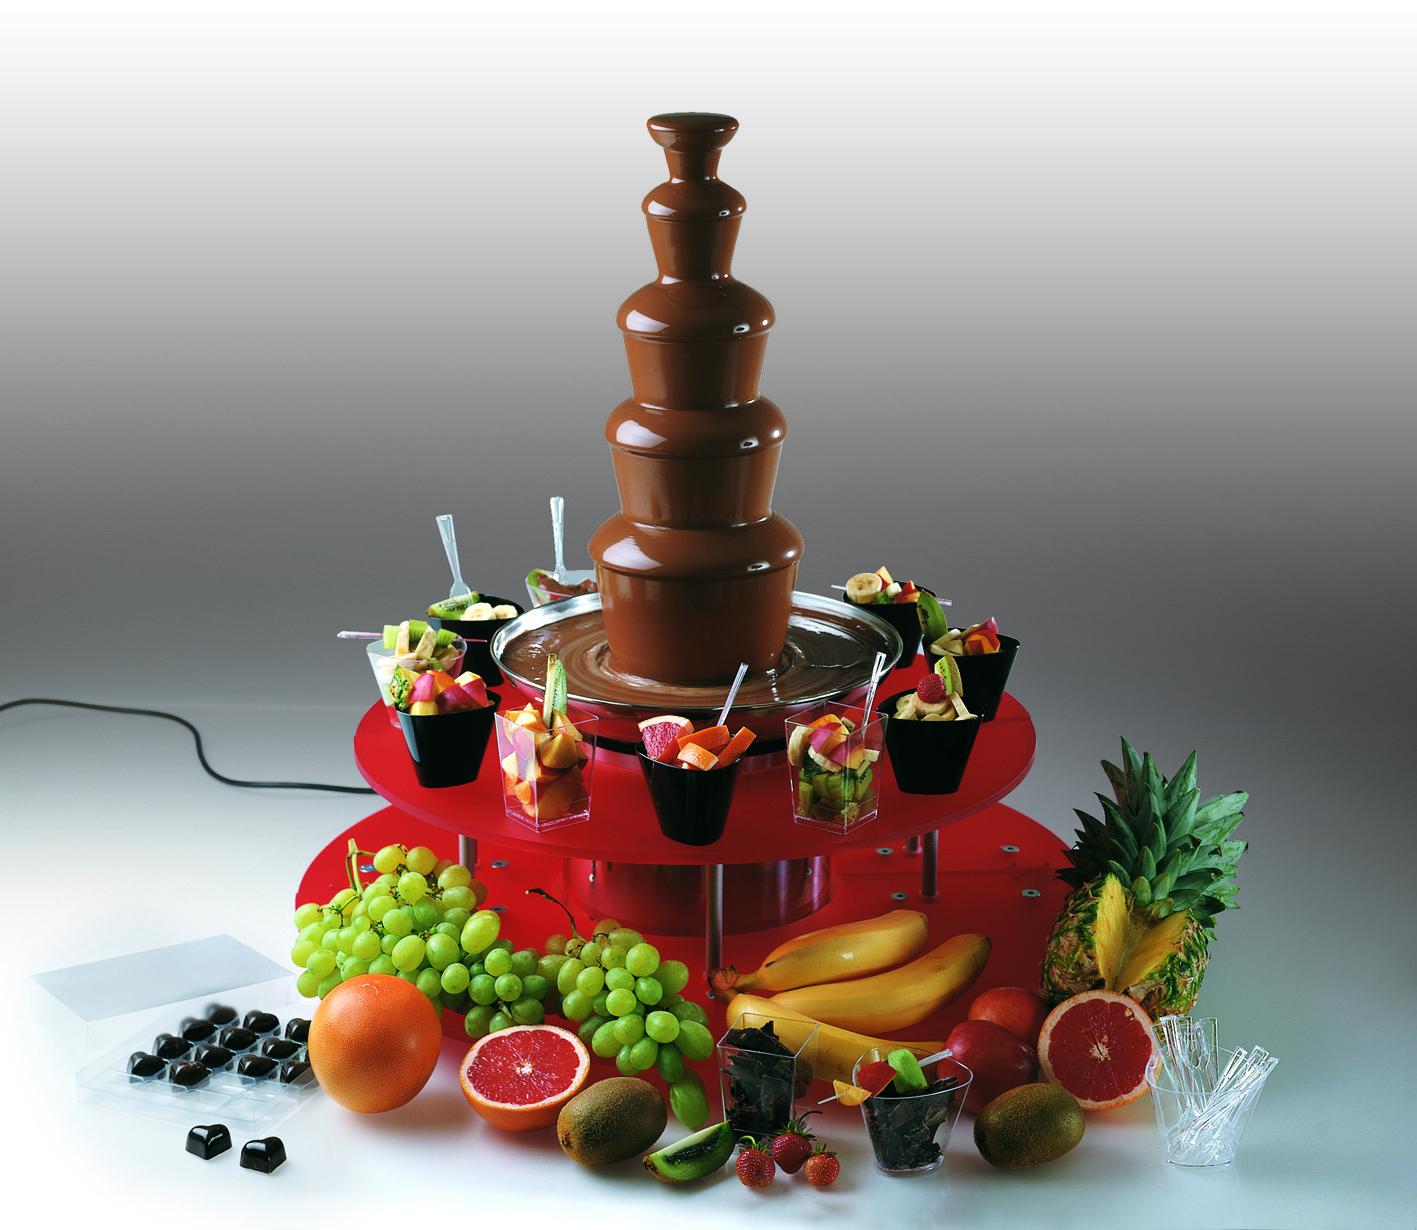 fusible pour fontaine chocolat 260440 matfer. Black Bedroom Furniture Sets. Home Design Ideas